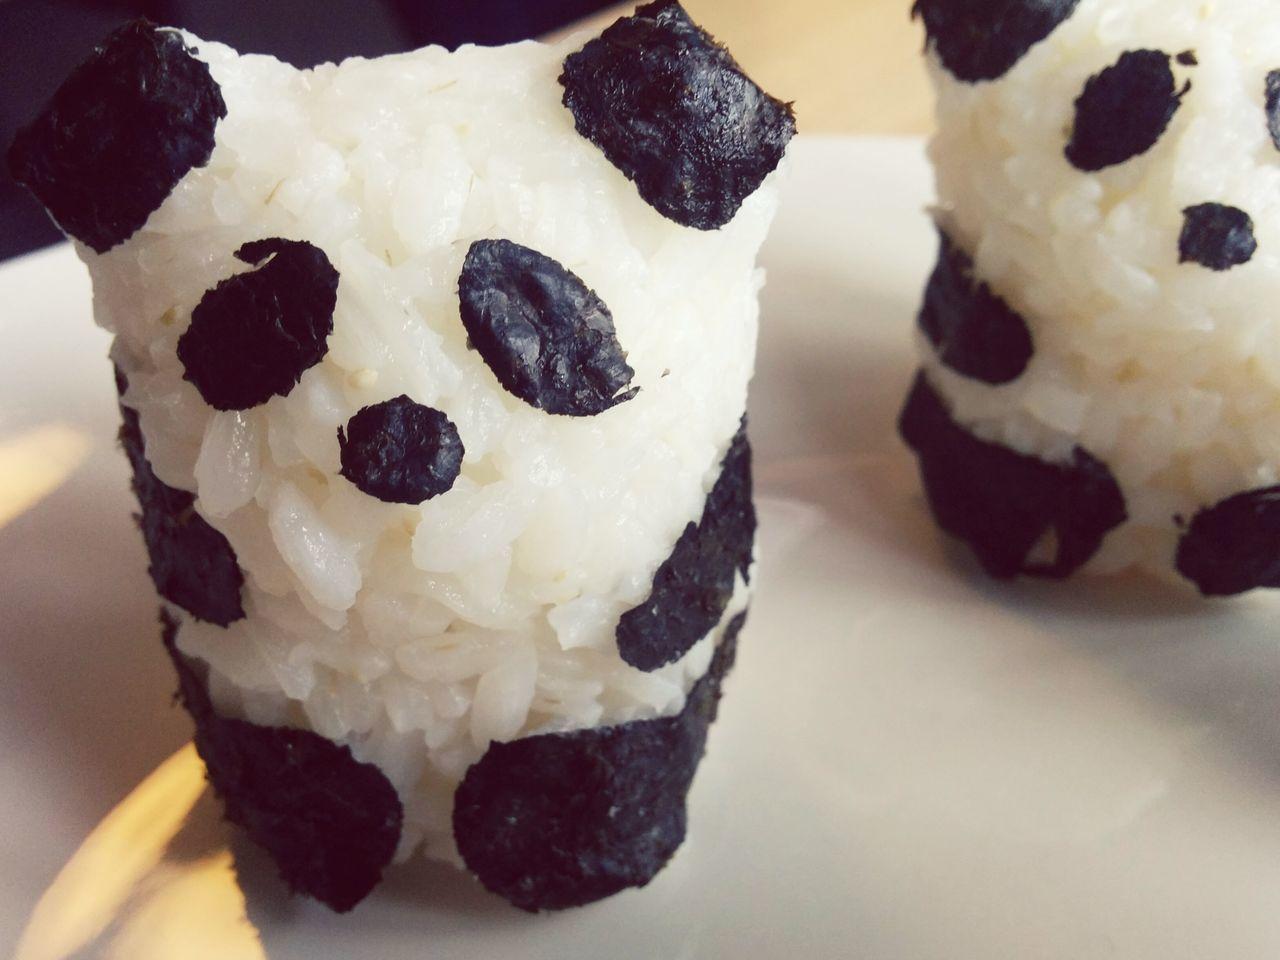 Taking Photos Enjoying Life Food <3 Panda Onigiri Friendship My World Of Food